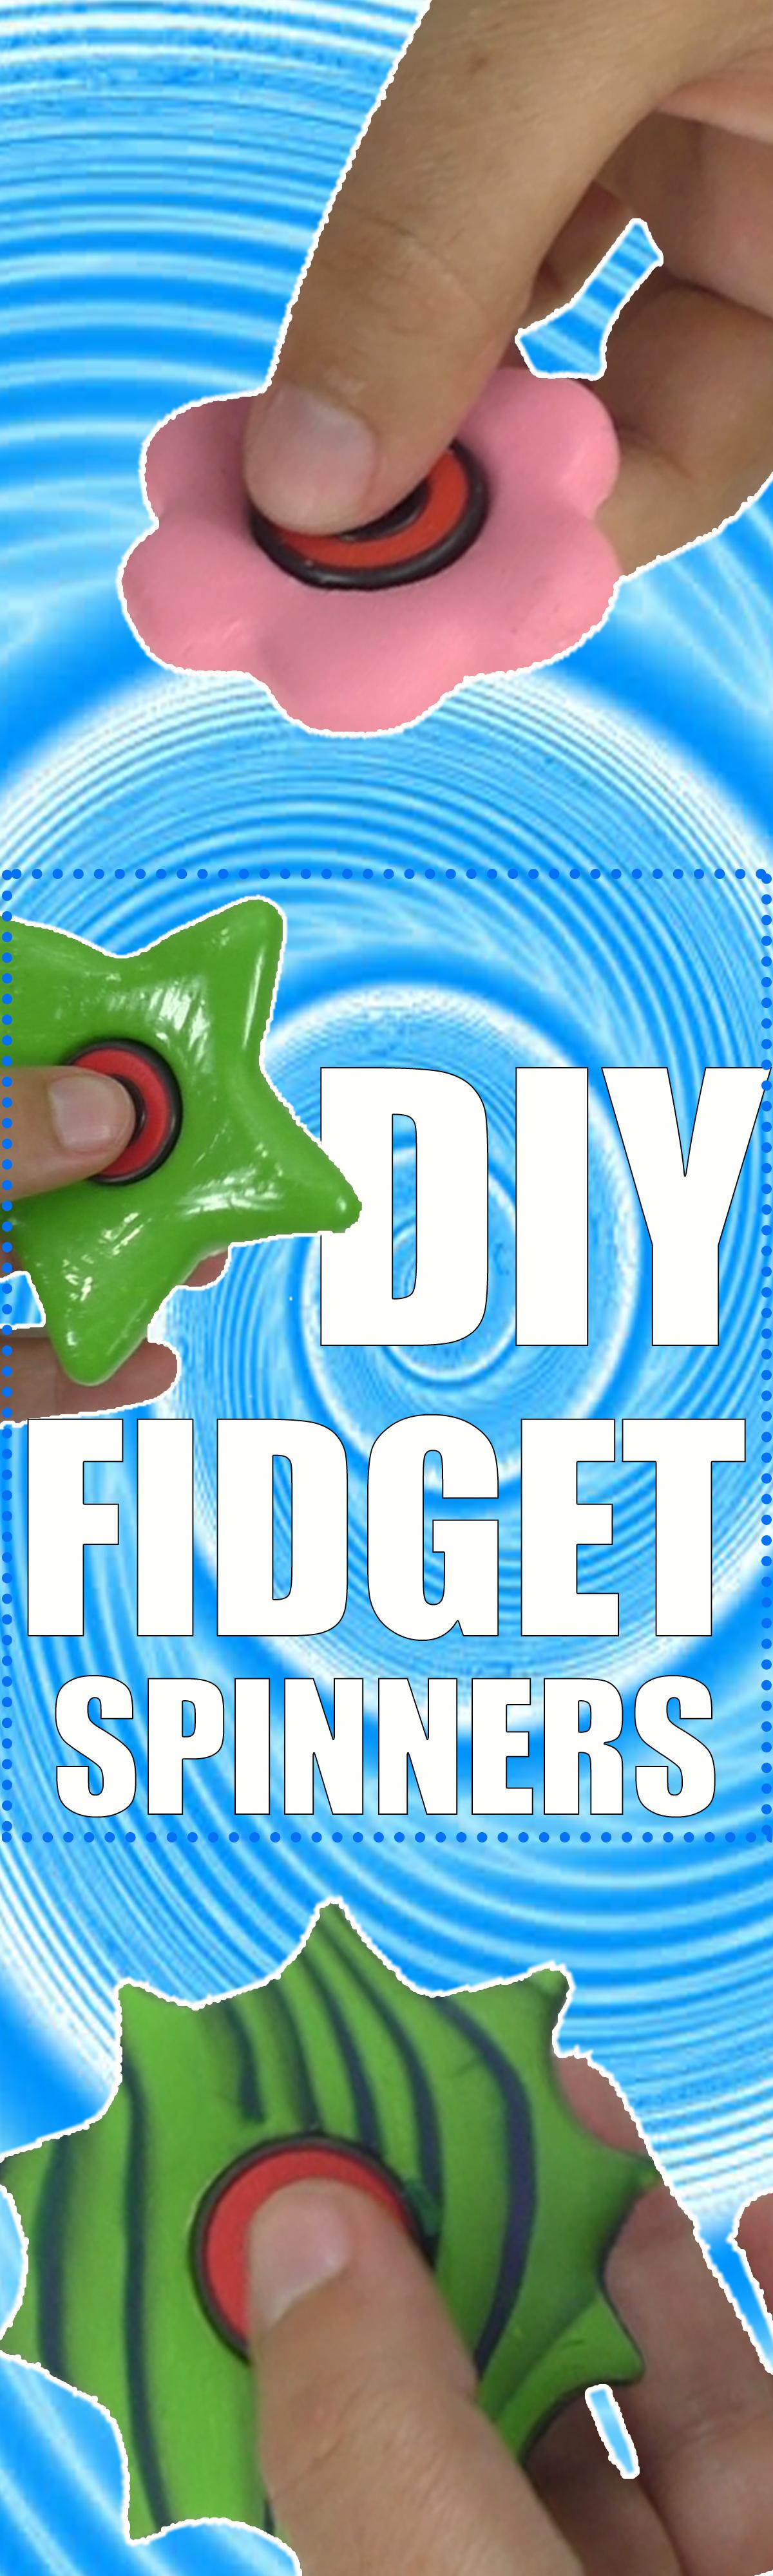 Amazon.com: build your own fidget spinner